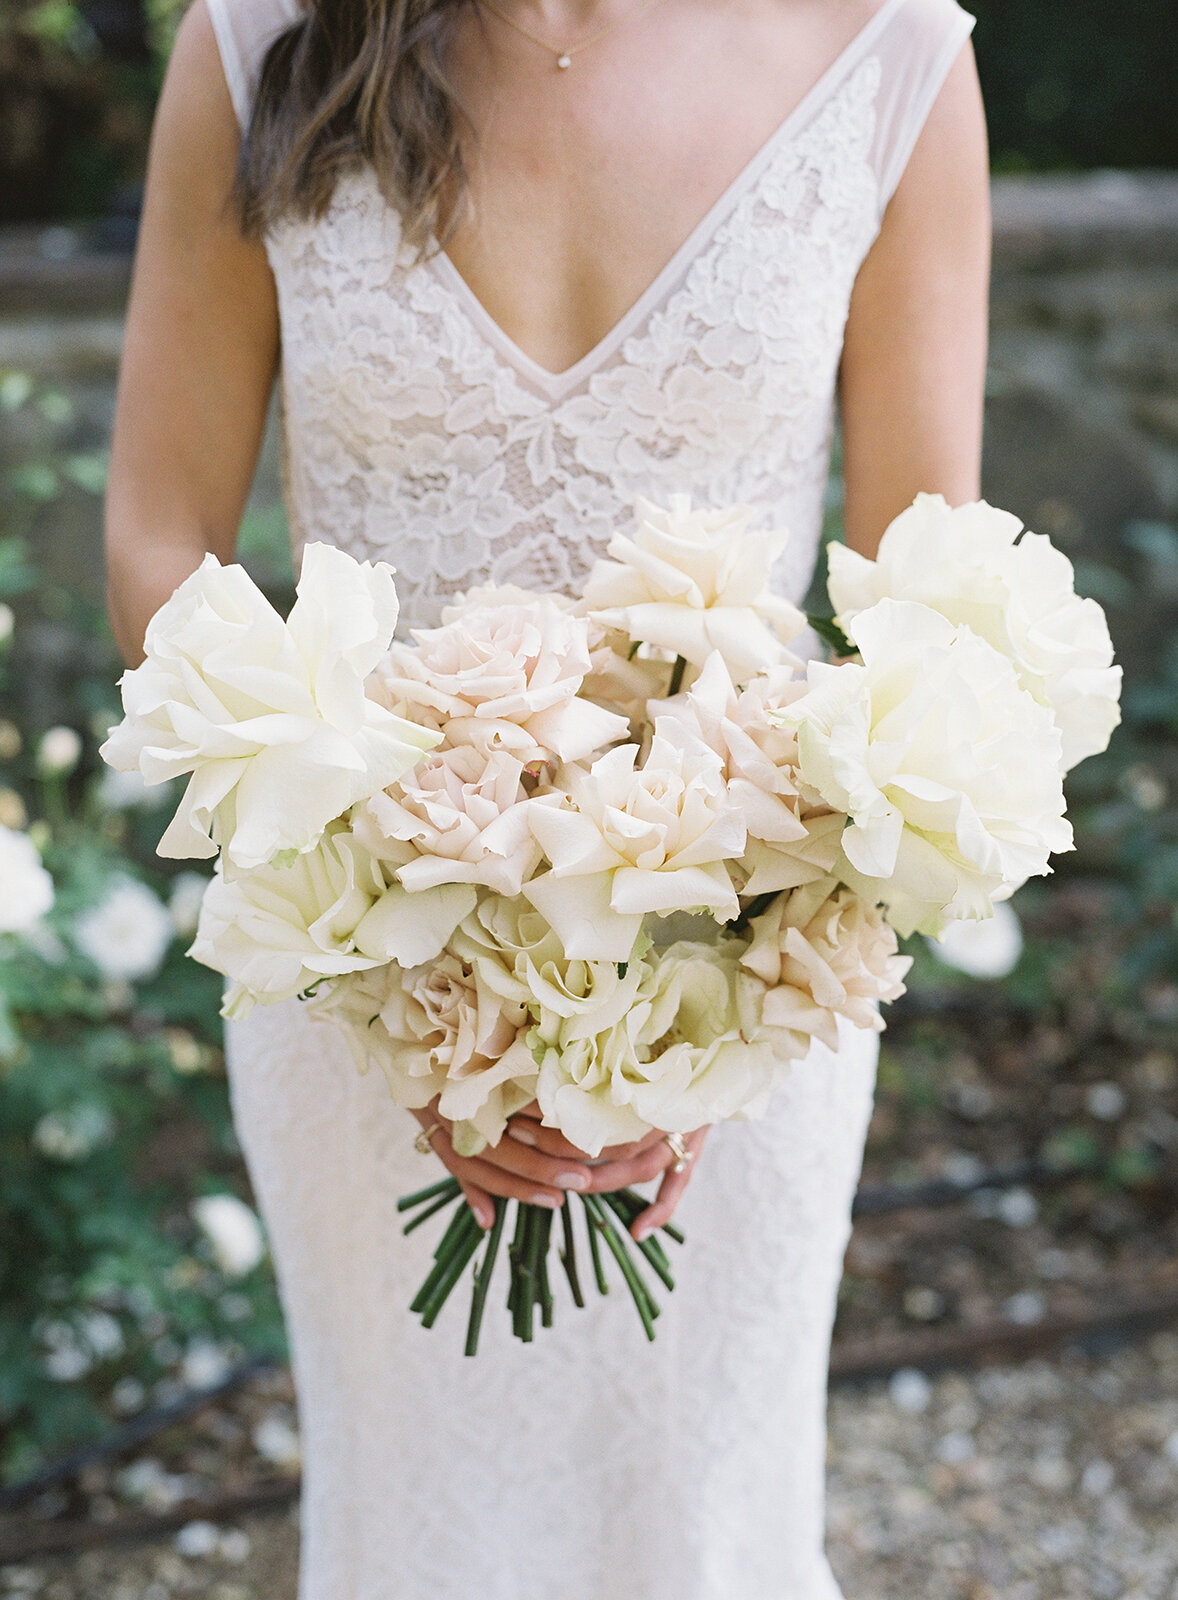 White-Blush-Garden-Rose-Bouquet-Williamsburg-Photo-Studios